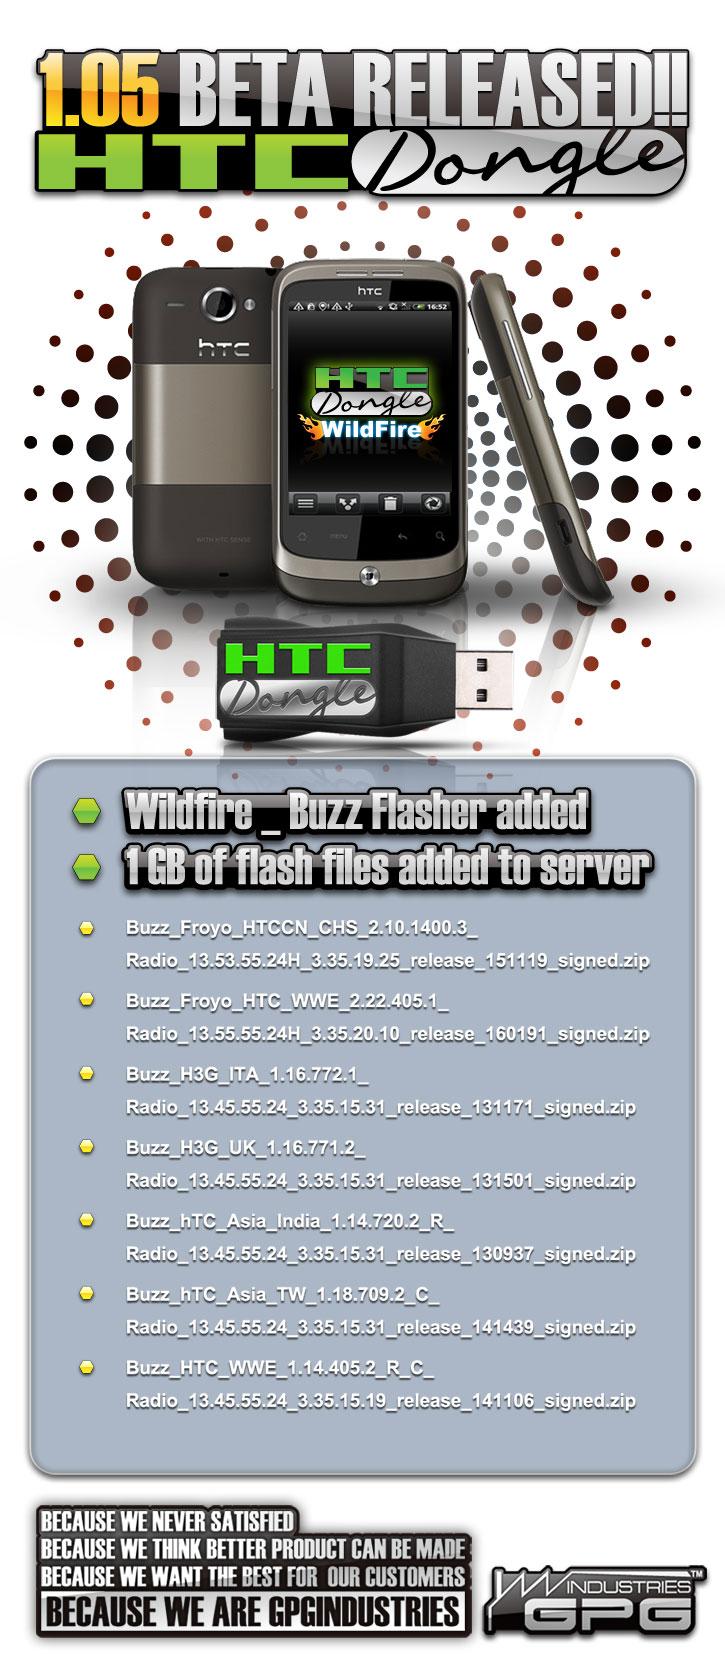 HTCDongle V105 Beta Released 21 725